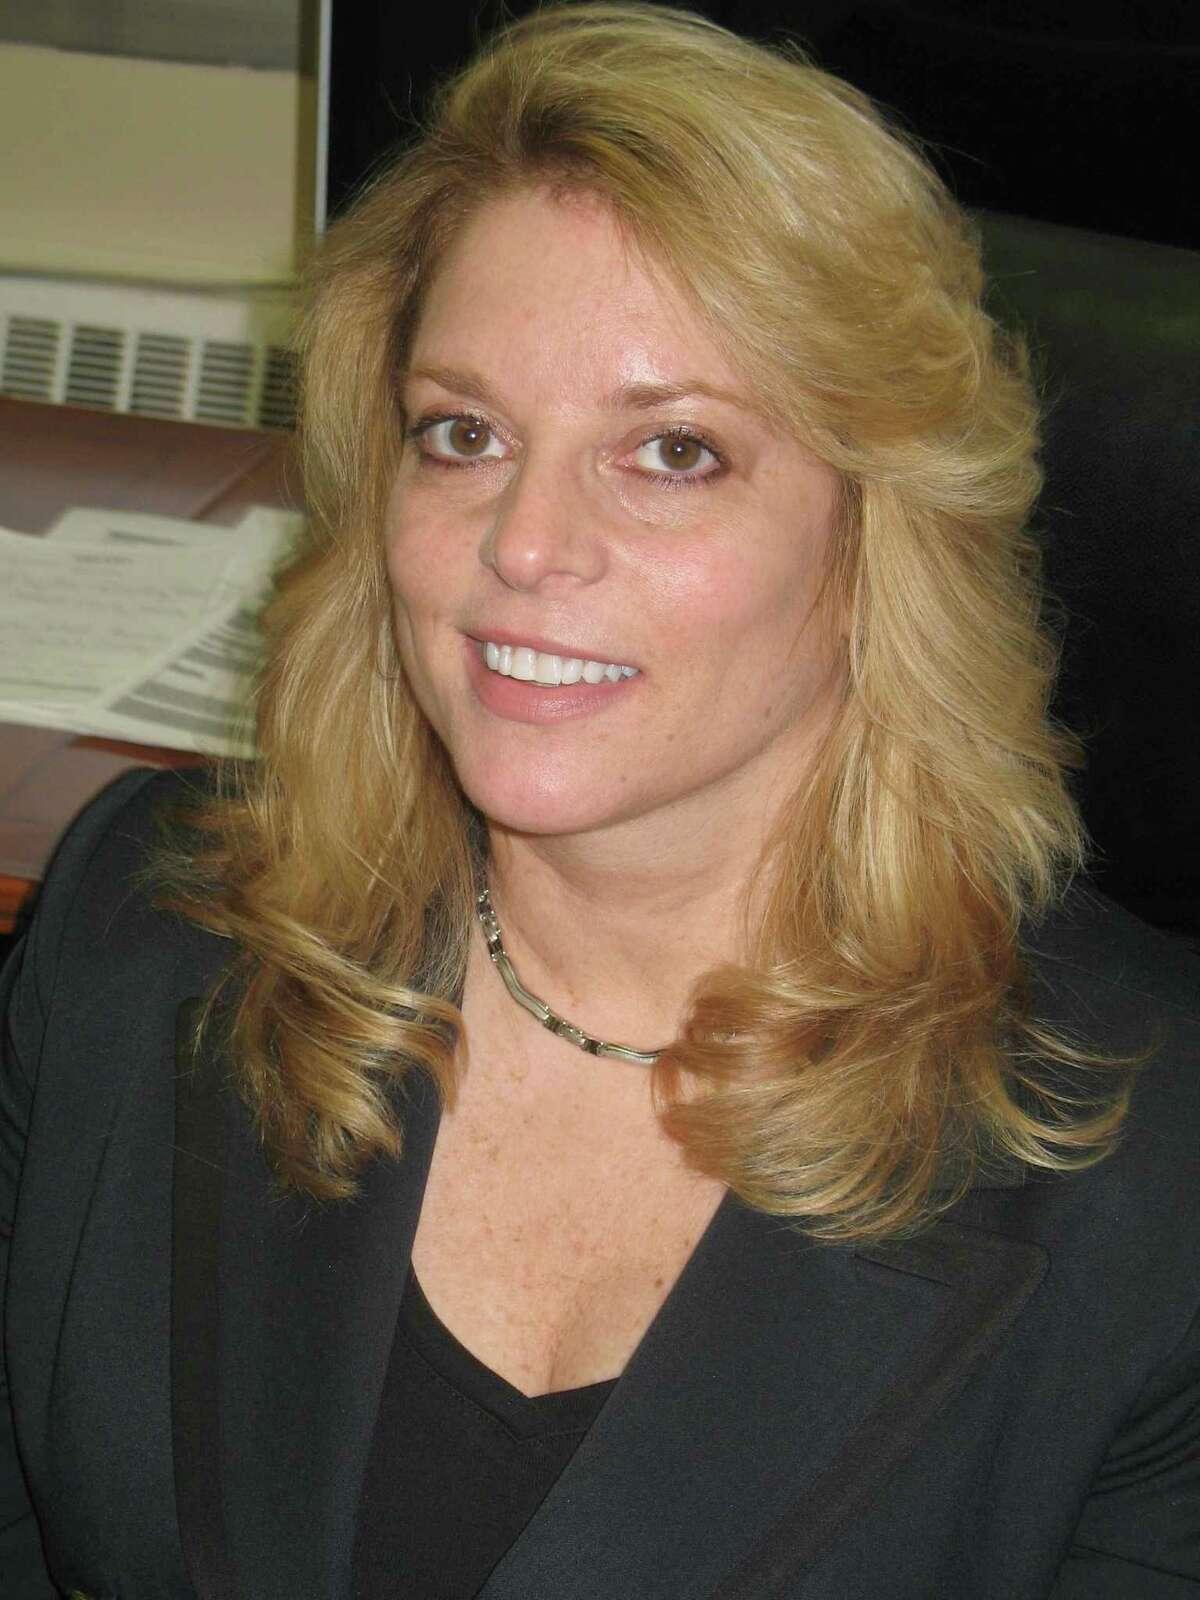 Stacey Gross, principal of Ridgefield High School.